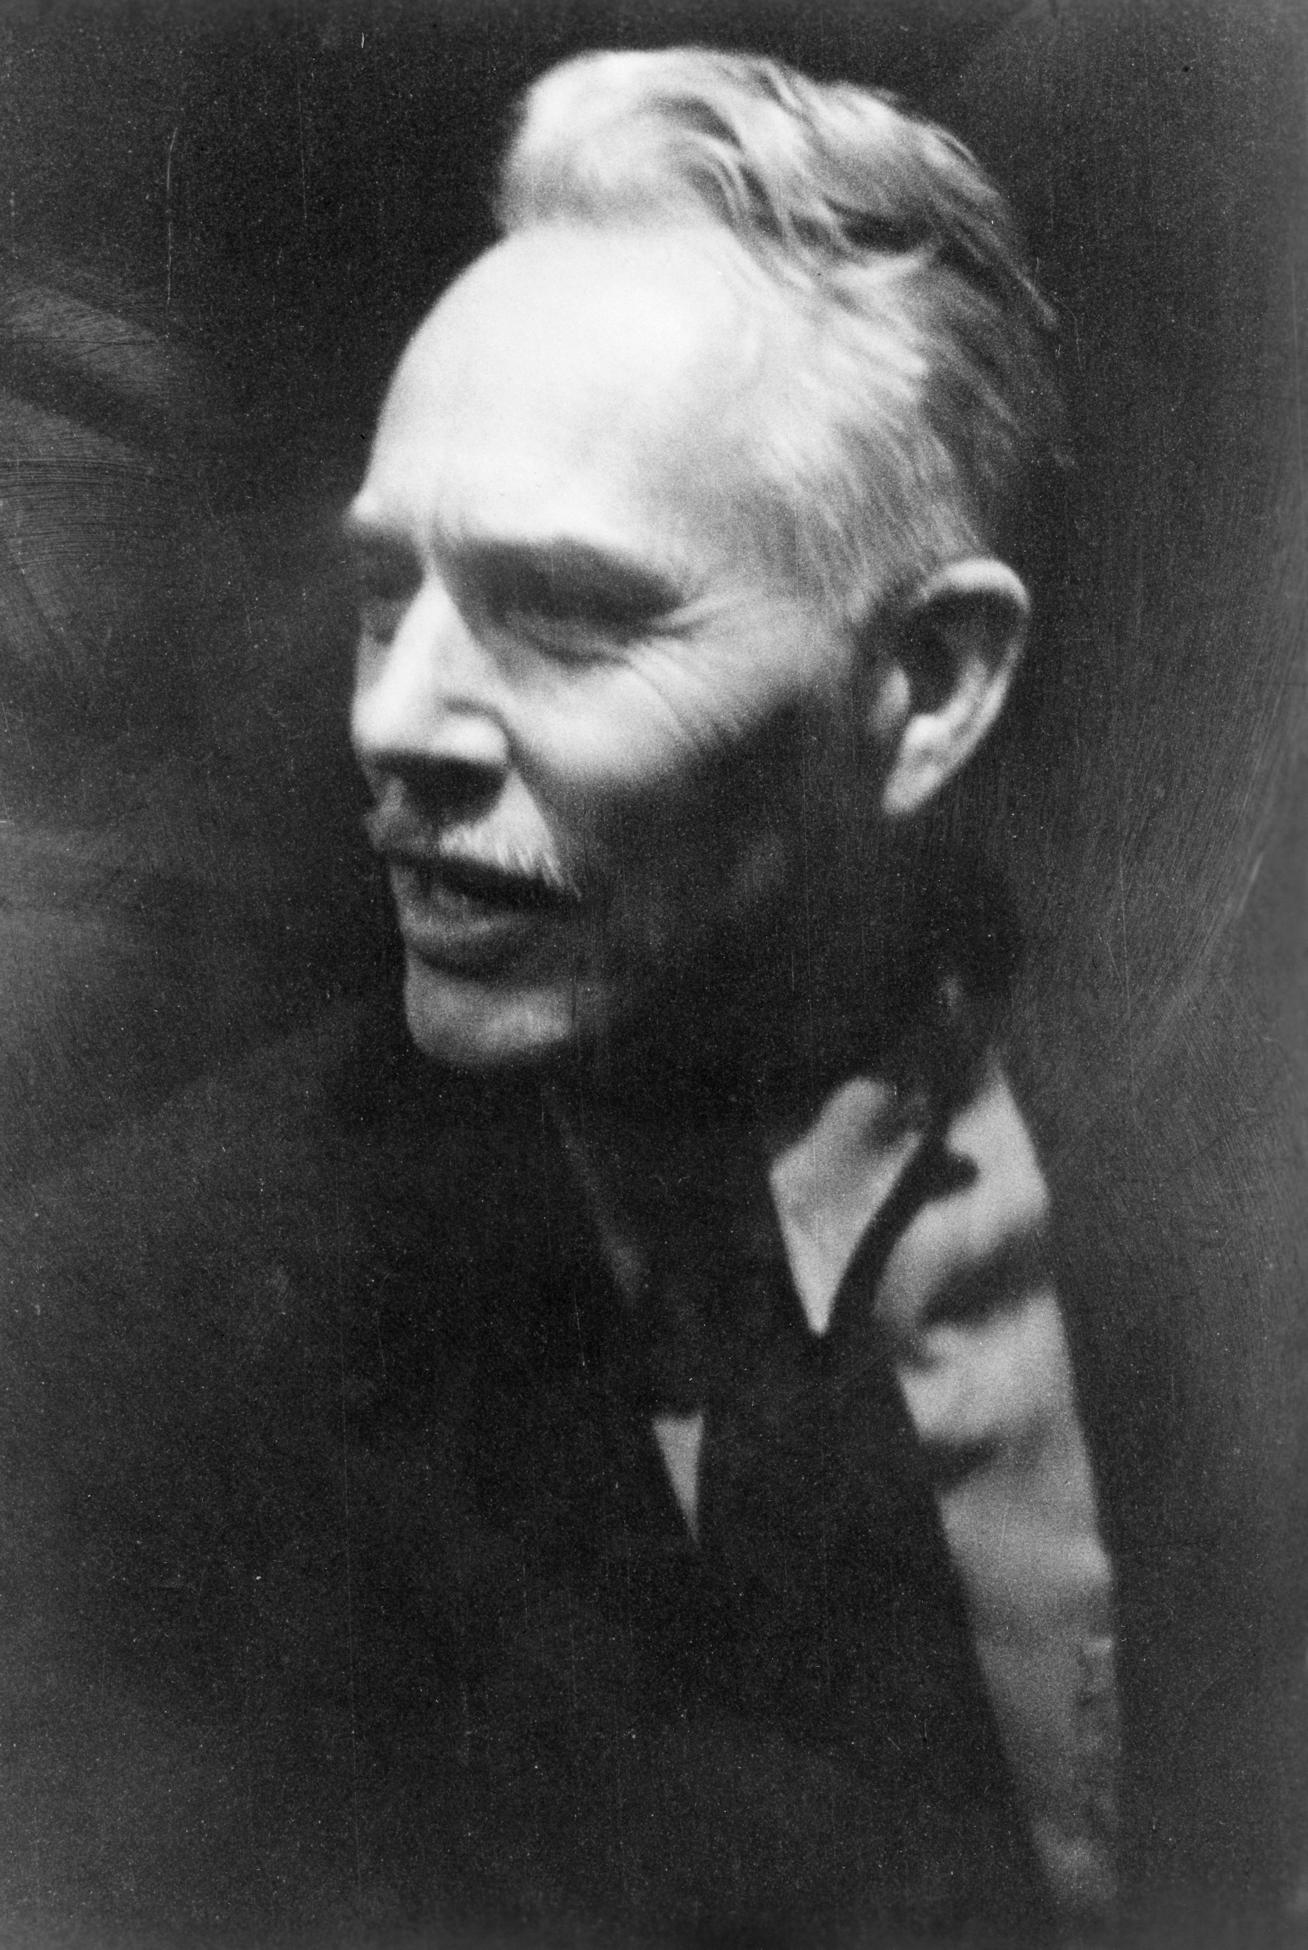 Harry Partch: June 24, 1901 - Sept.3, 1974